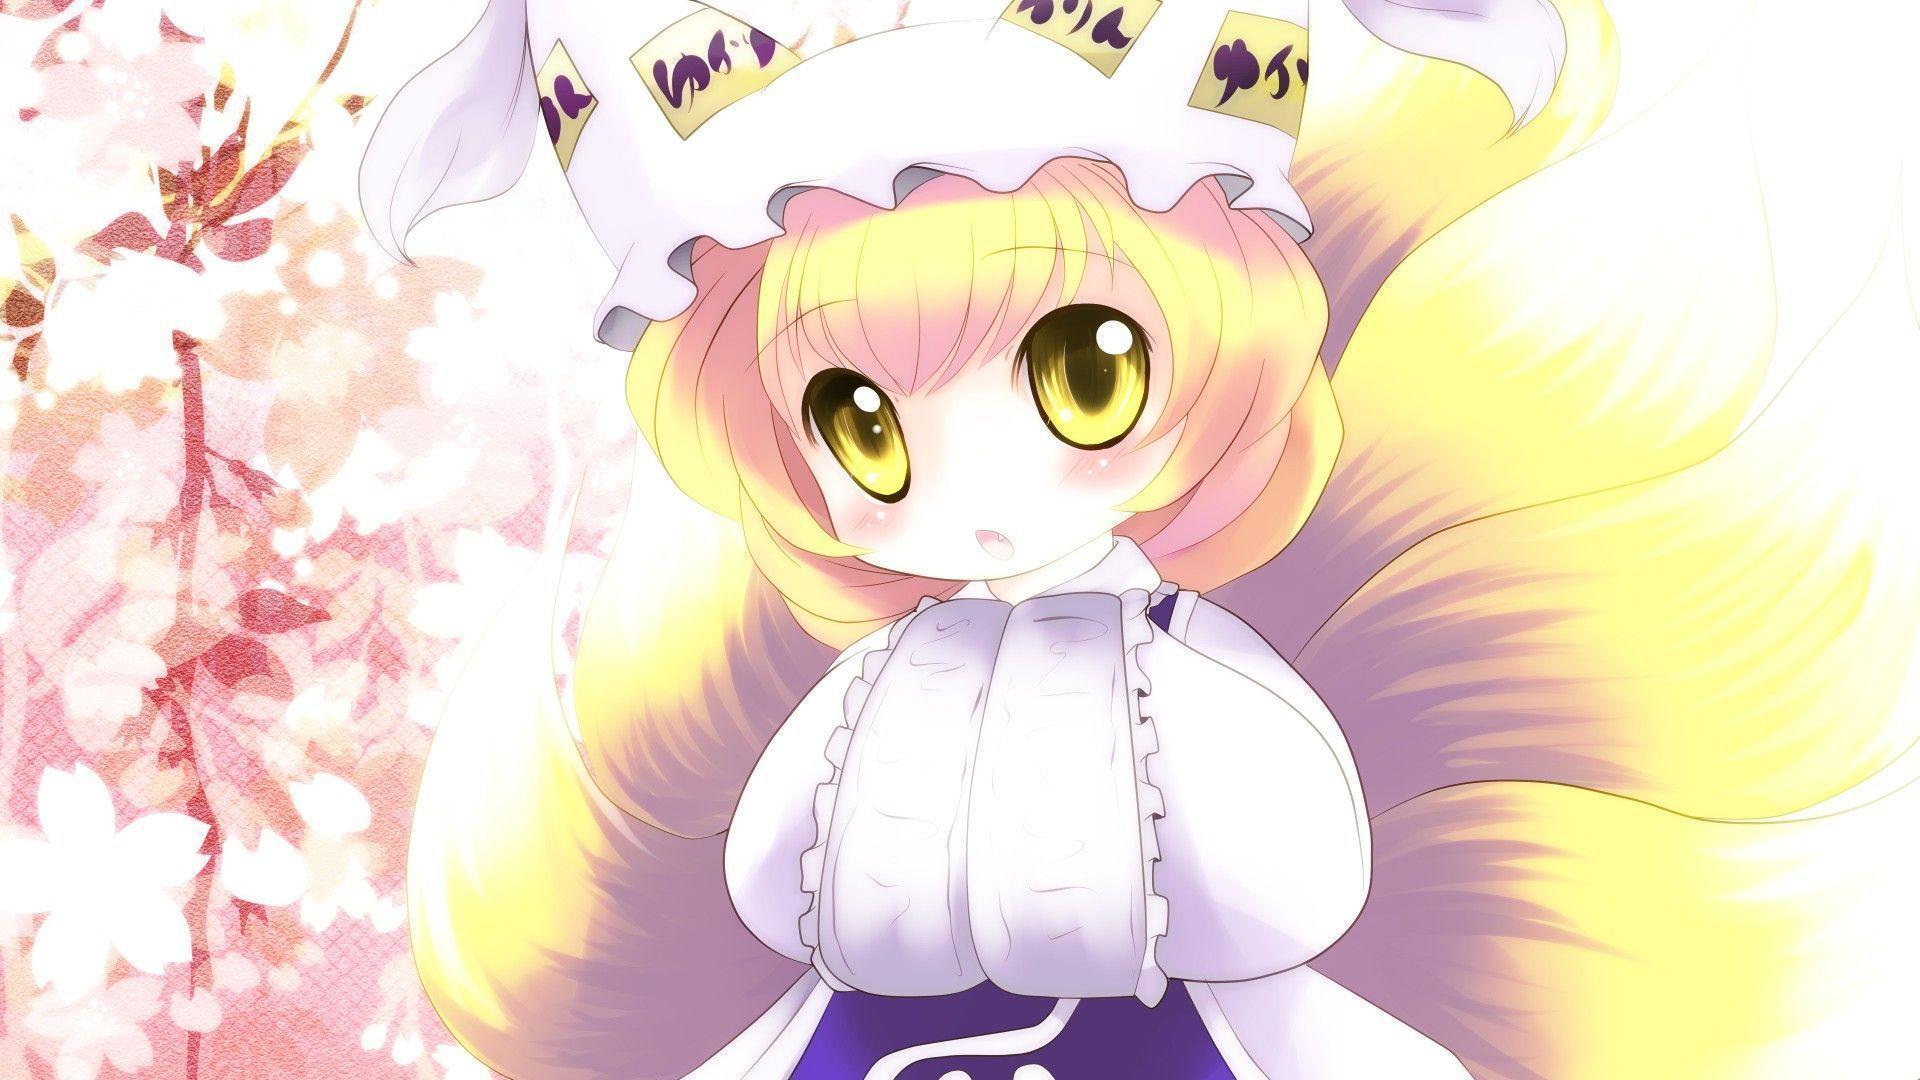 Cute Chibis Anime wwwimgkidcom   The Image Kid Has It 1920x1080